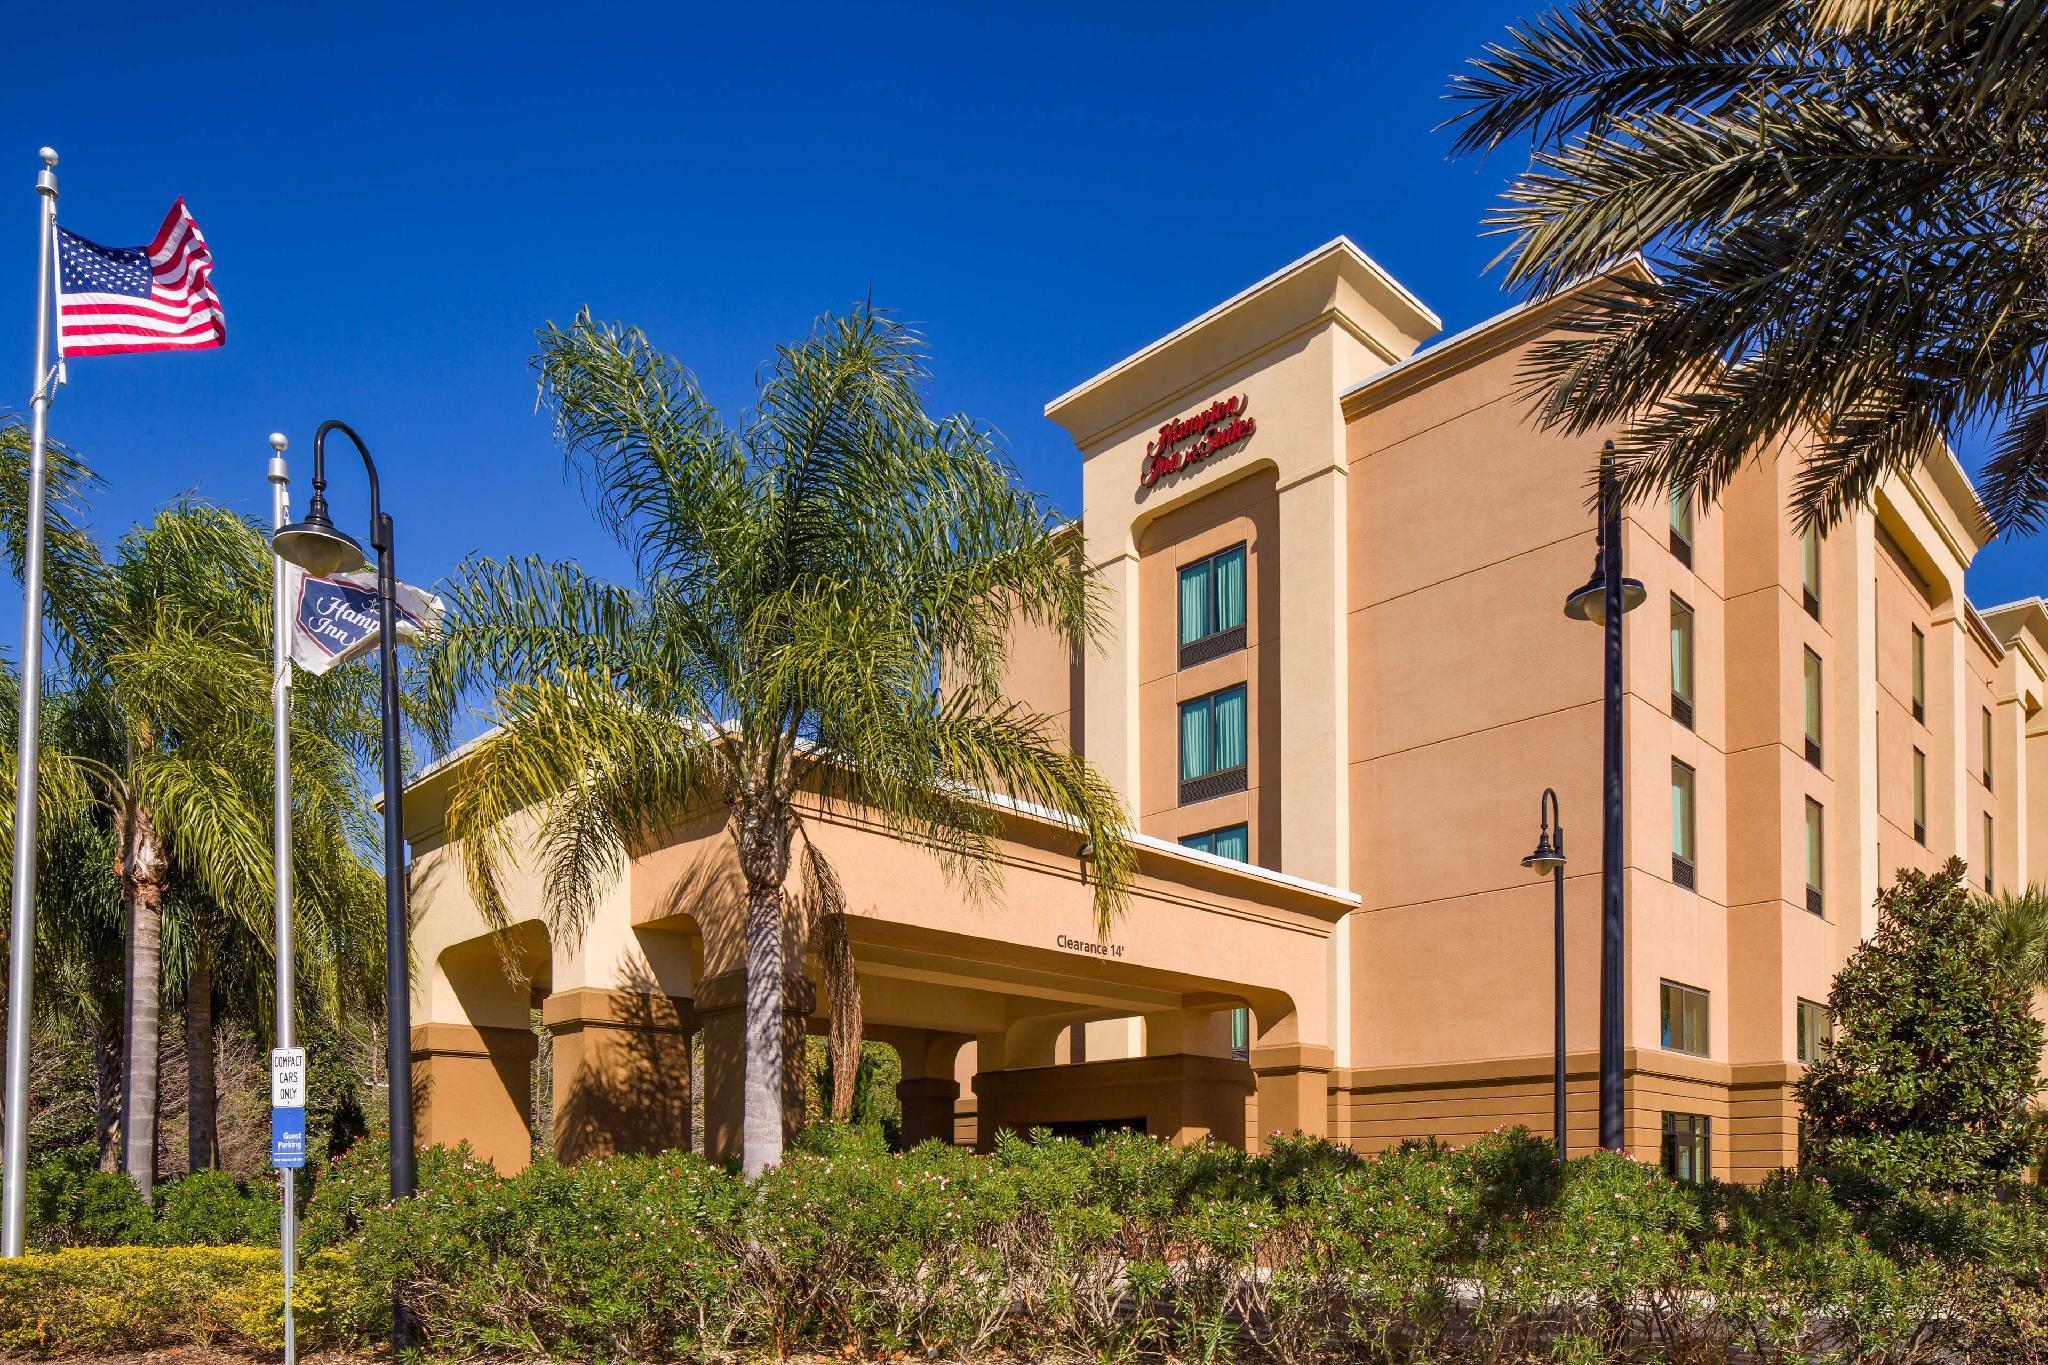 Hampton Inn And Suites Orlando Apopka